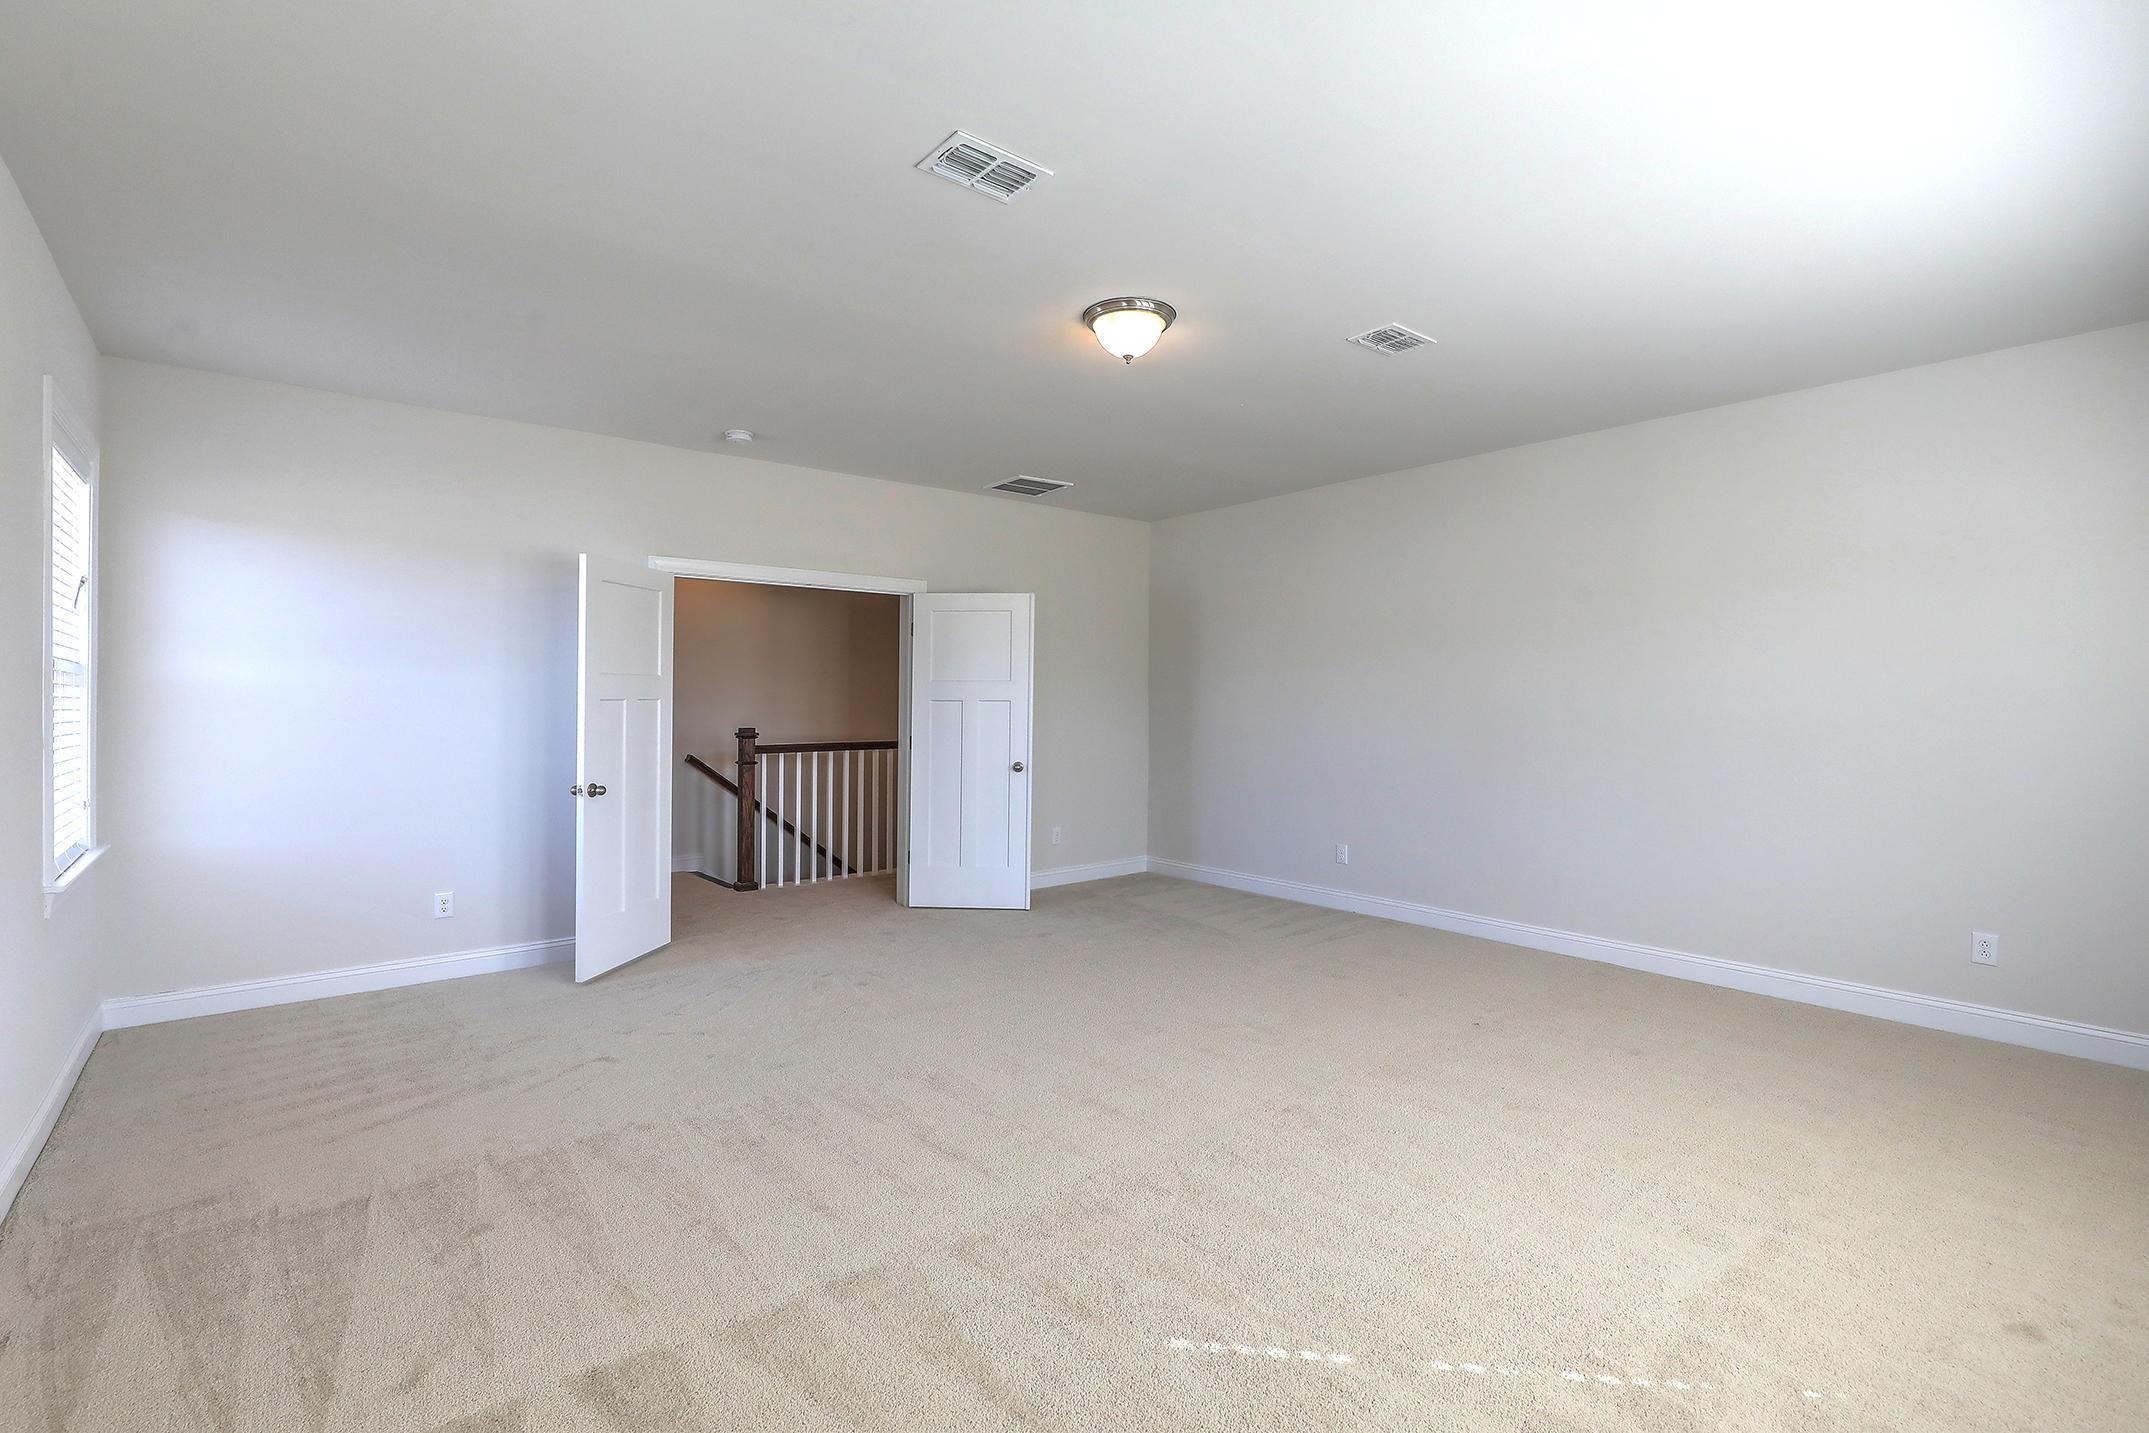 Bentley Park Homes For Sale - 1281 Gannett, Mount Pleasant, SC - 2